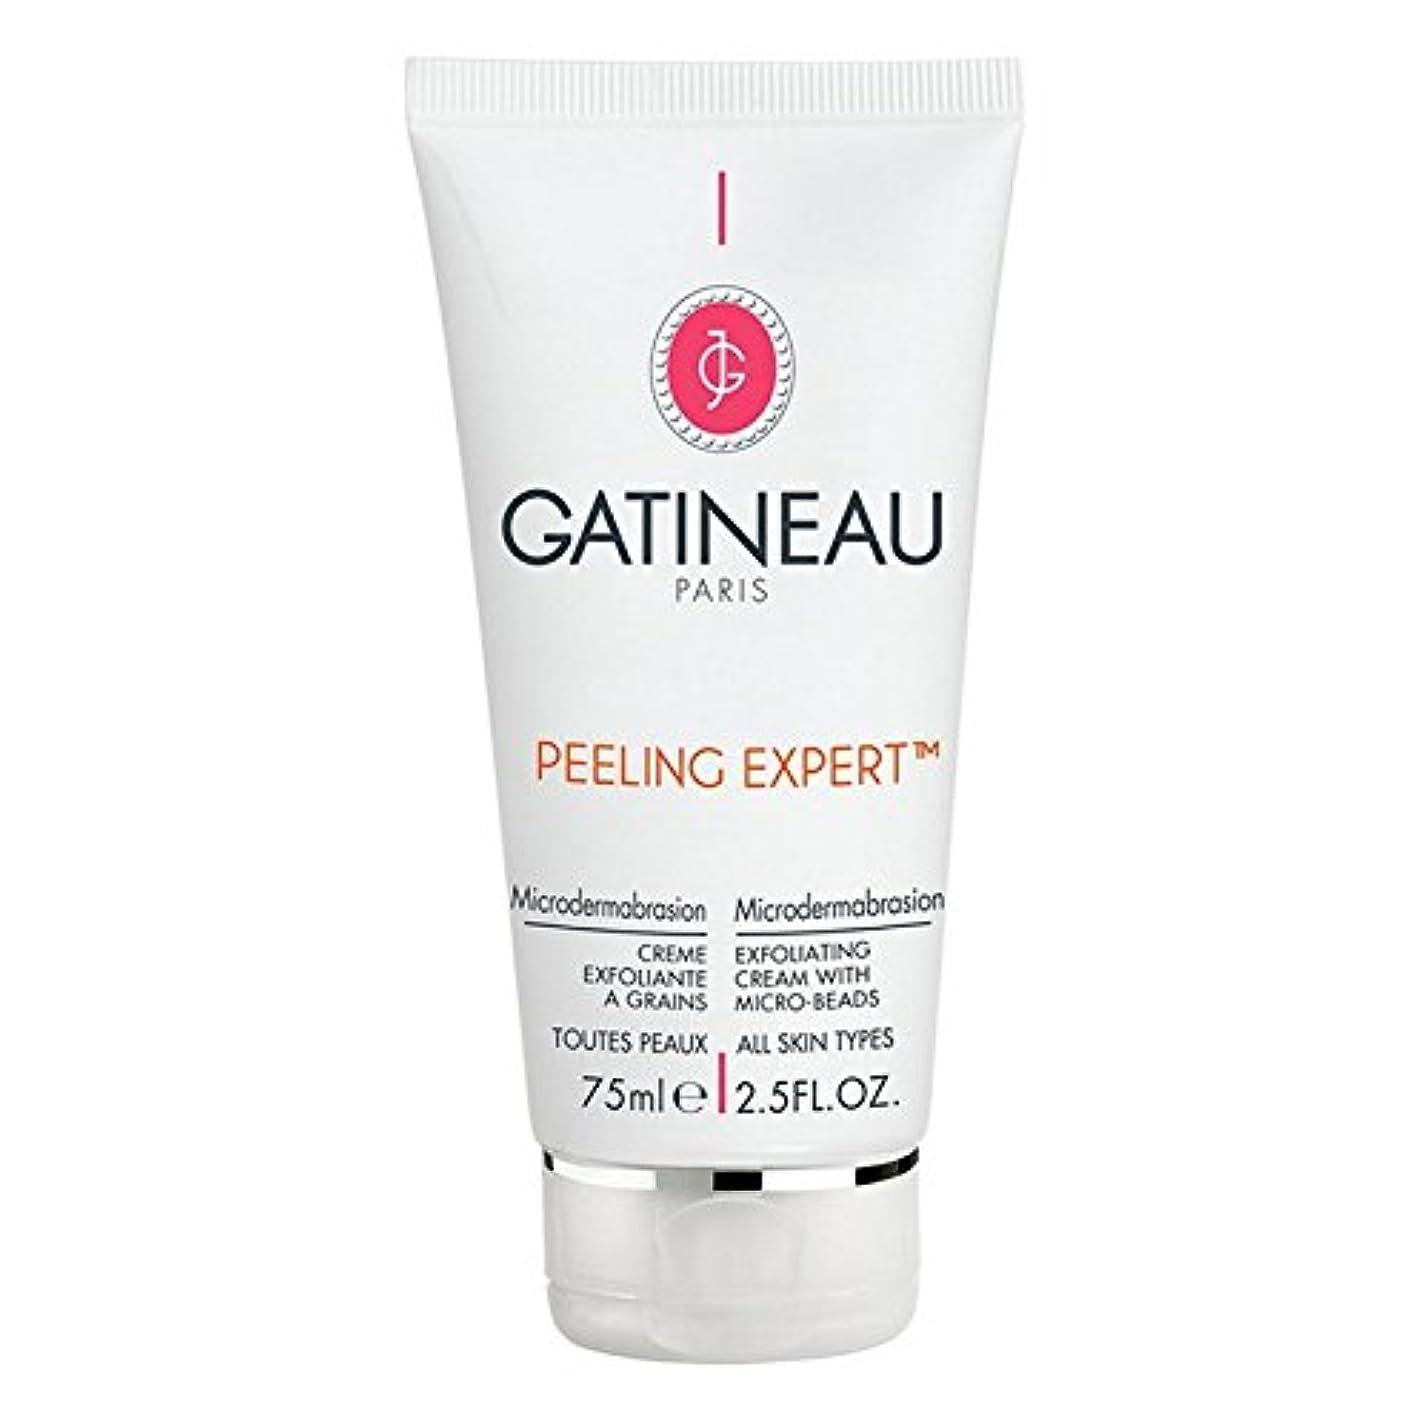 Gatineau Pro-Radiance Microdermabrasion Cream 75ml (Pack of 6) - ガティノープロ輝きマイクロダーマブレーションクリーム75ミリリットル x6 [並行輸入品]